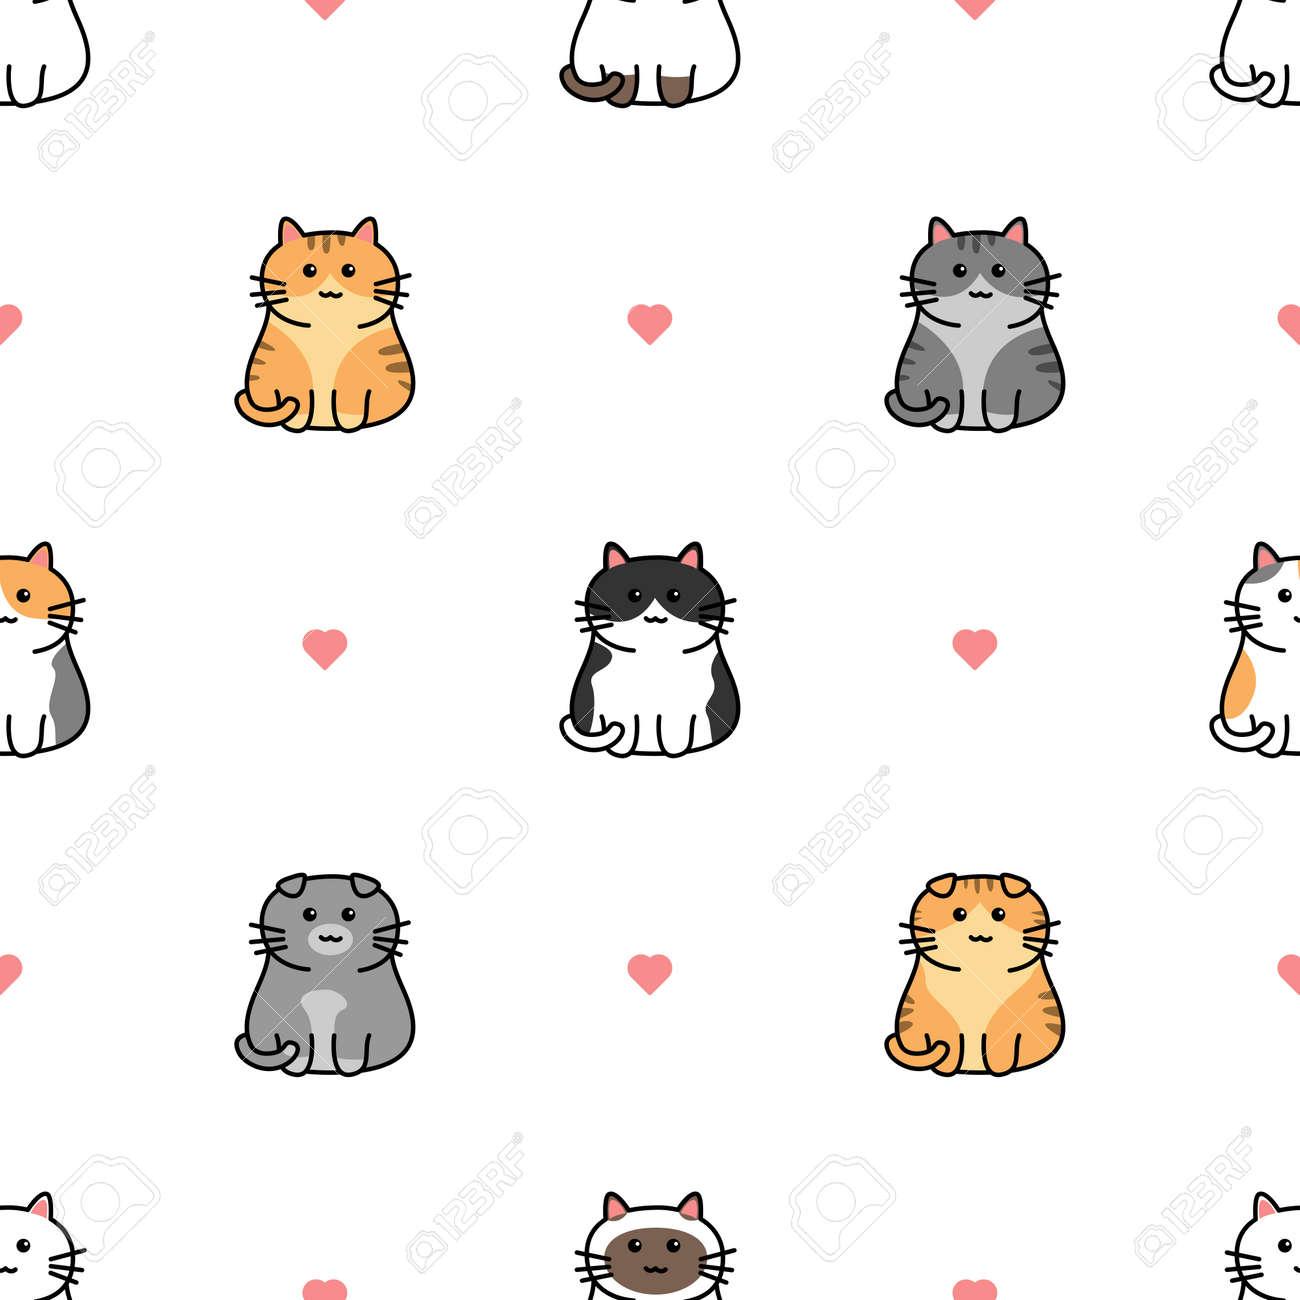 Cute cat with heart cartoon seamless pattern, vector illustration - 169151634